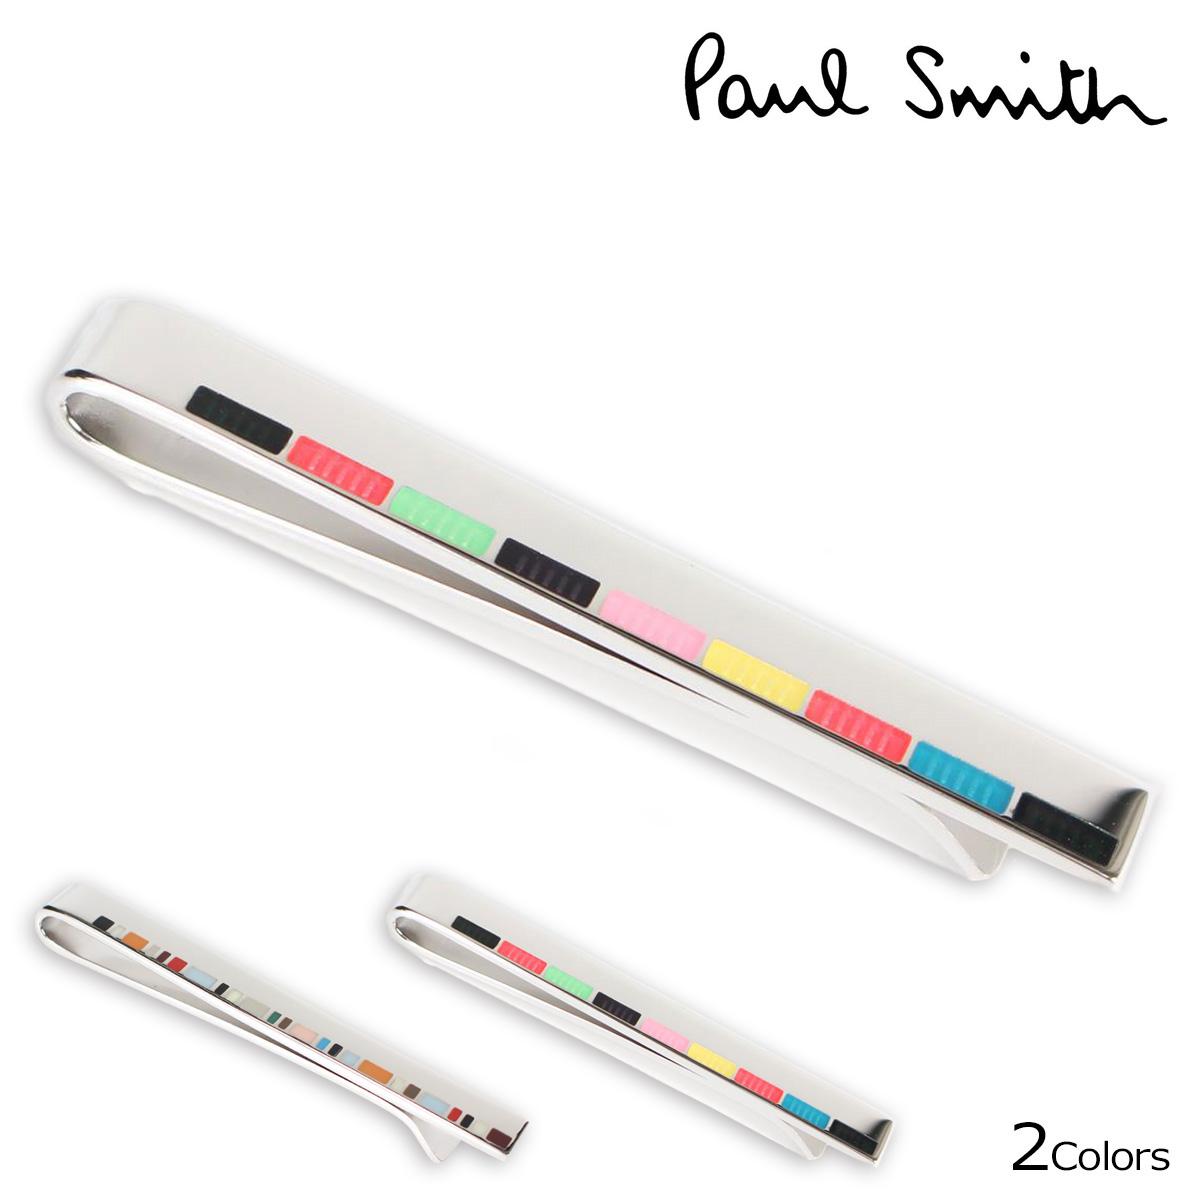 Paul Smith ネクタイピン ポールスミス メンズ タイバー TIE PIN シルバー